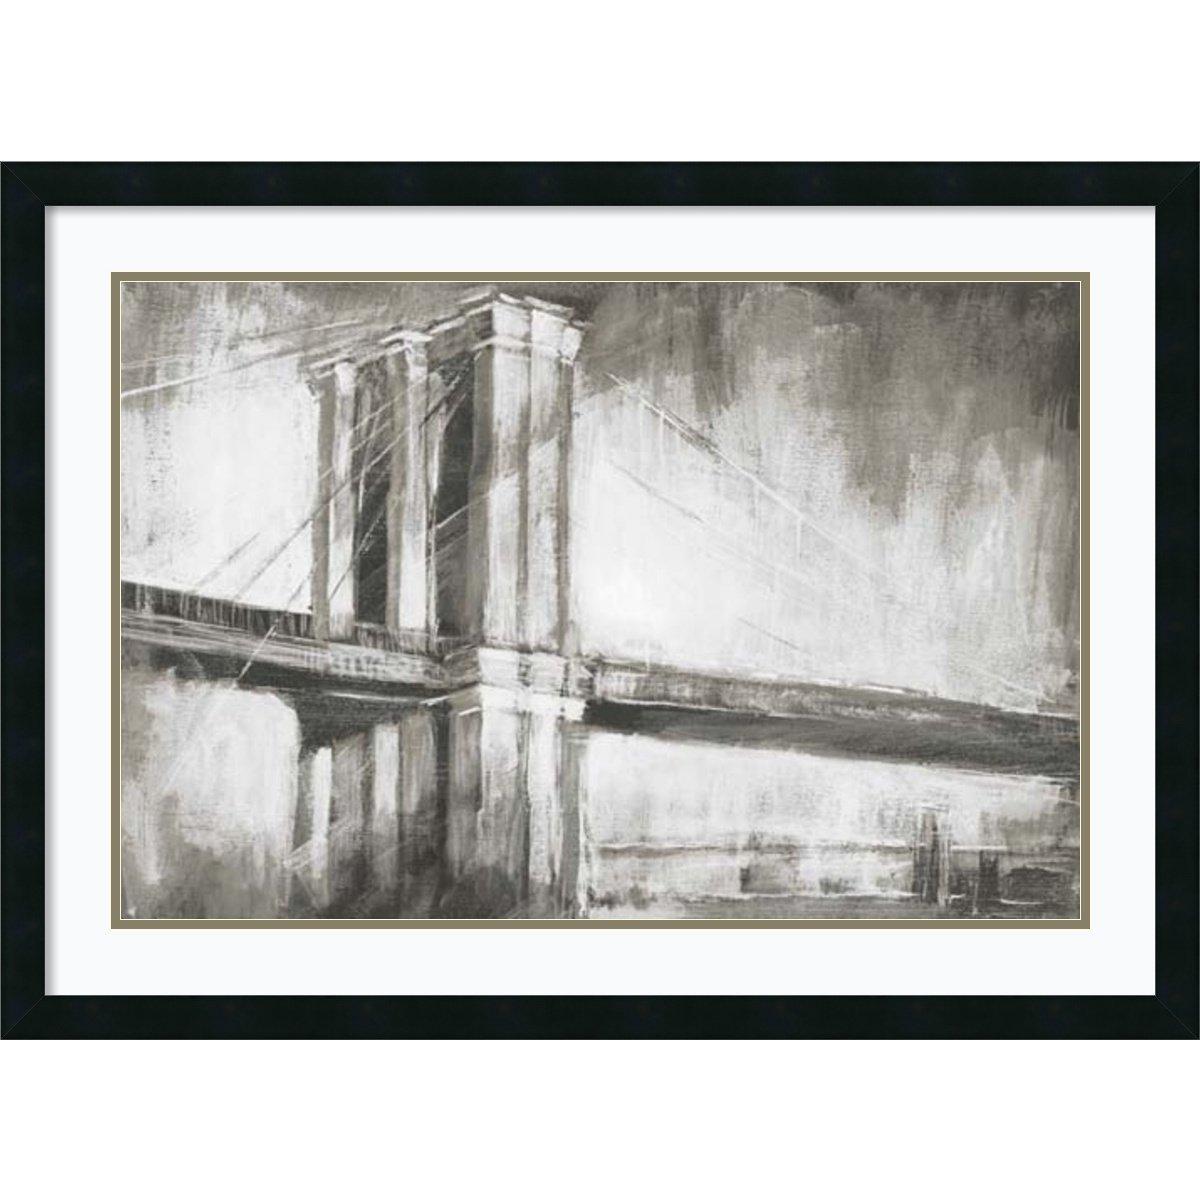 Framed Art Print 'Historic Suspension Bridge II' by Ethan Harper: Outer Size 37 x 27''